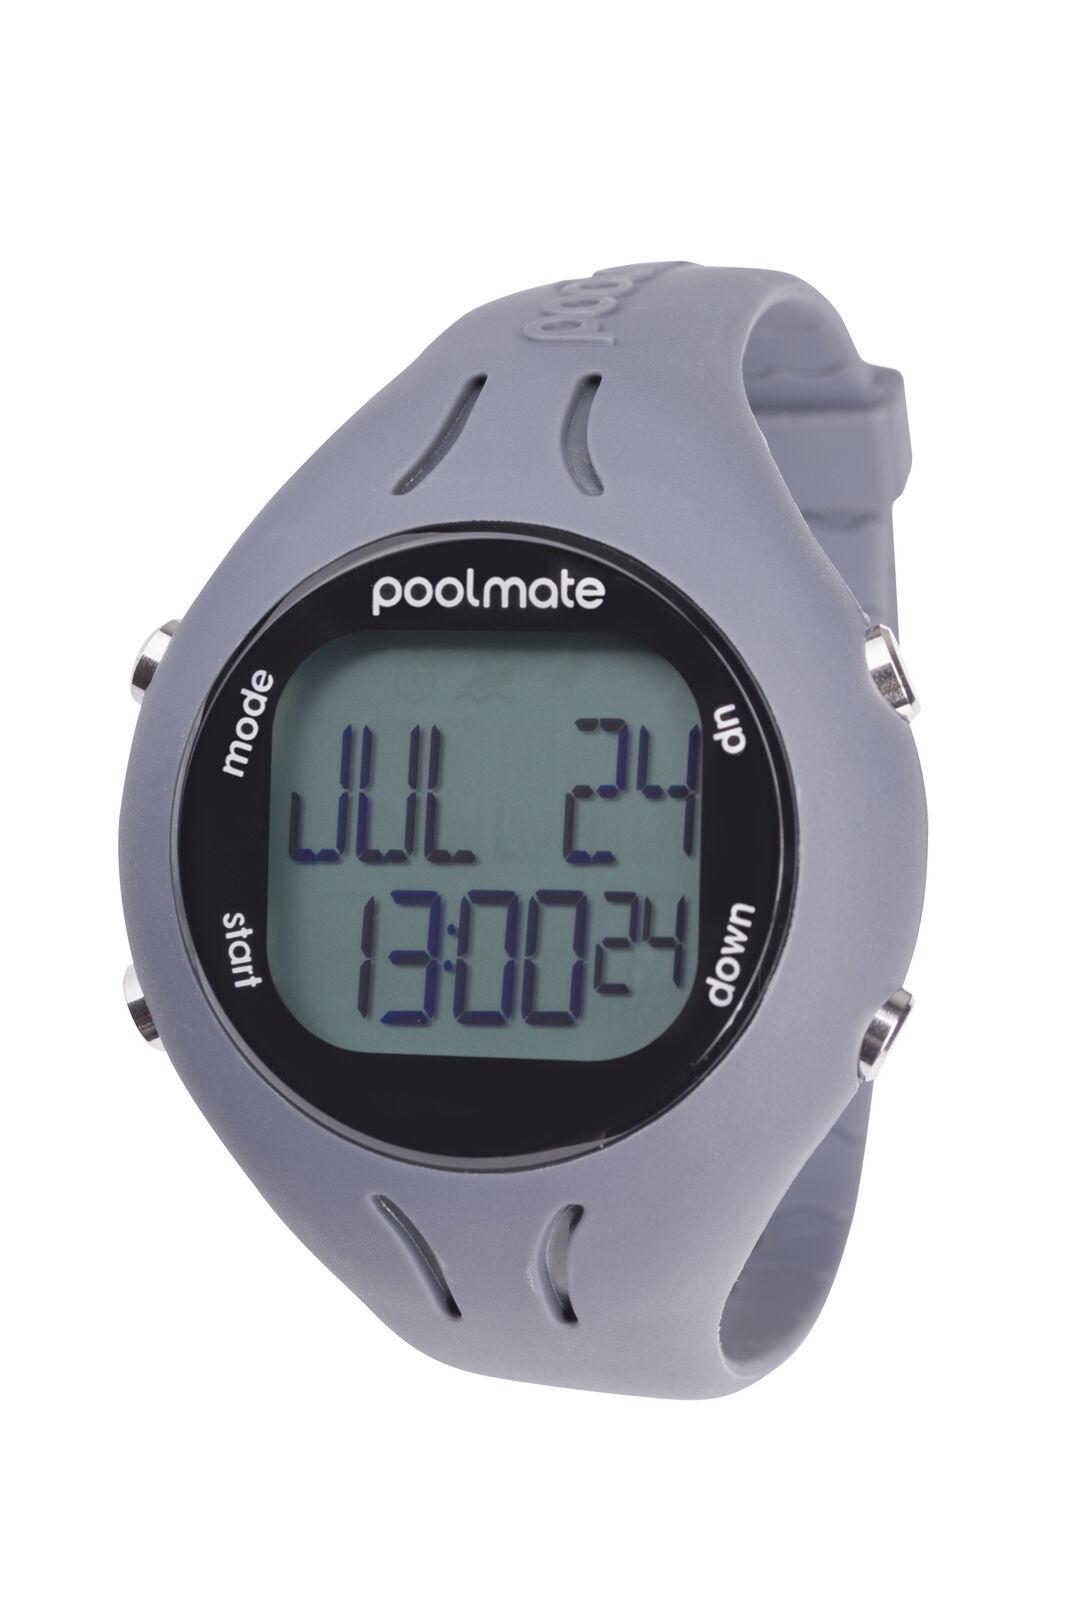 Swimovate PoolMate2 Digital Watch - Grey